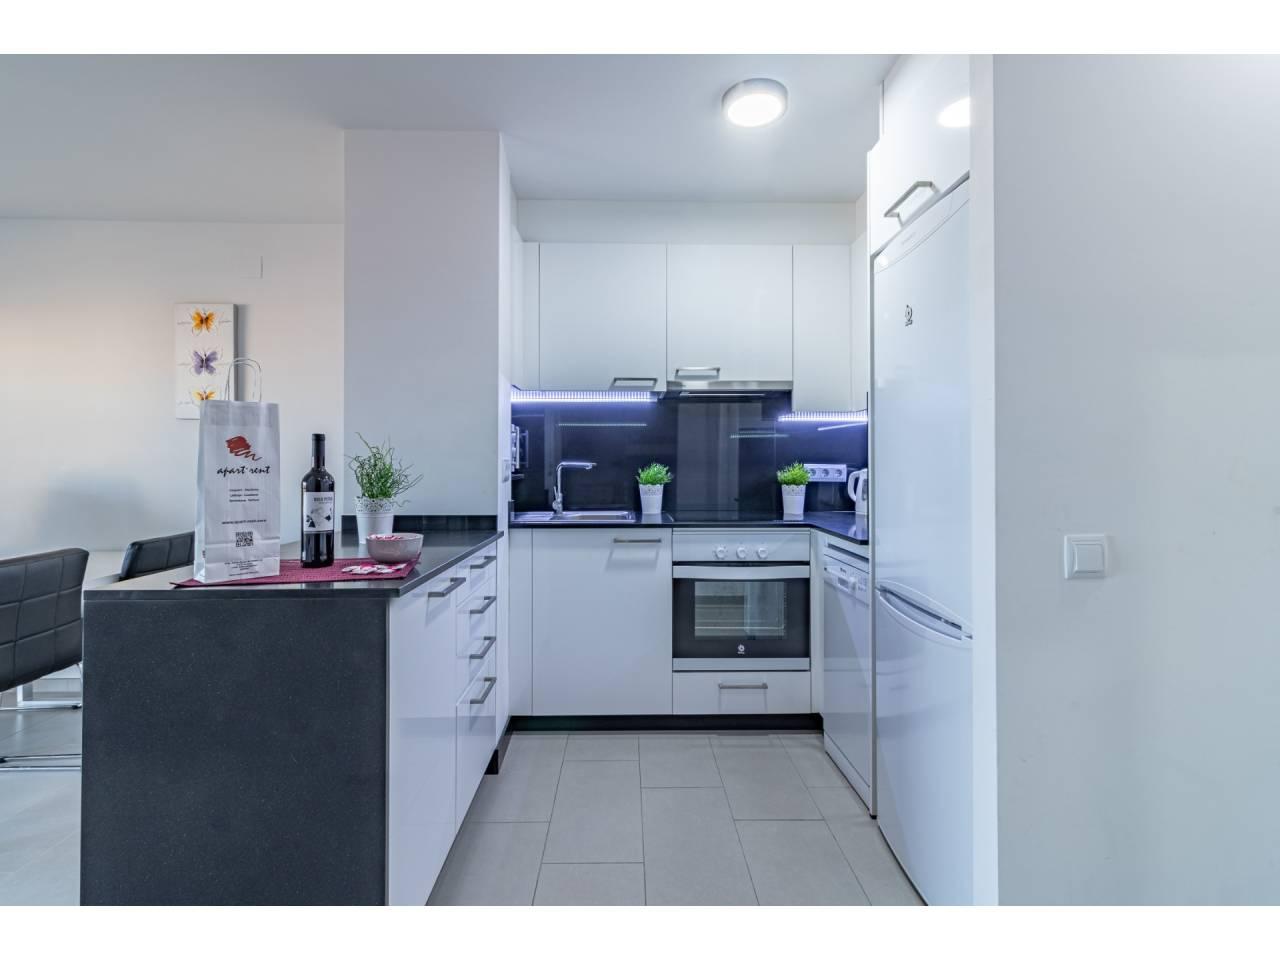 880175 - Apartment for short-term rental in Empuriabrava